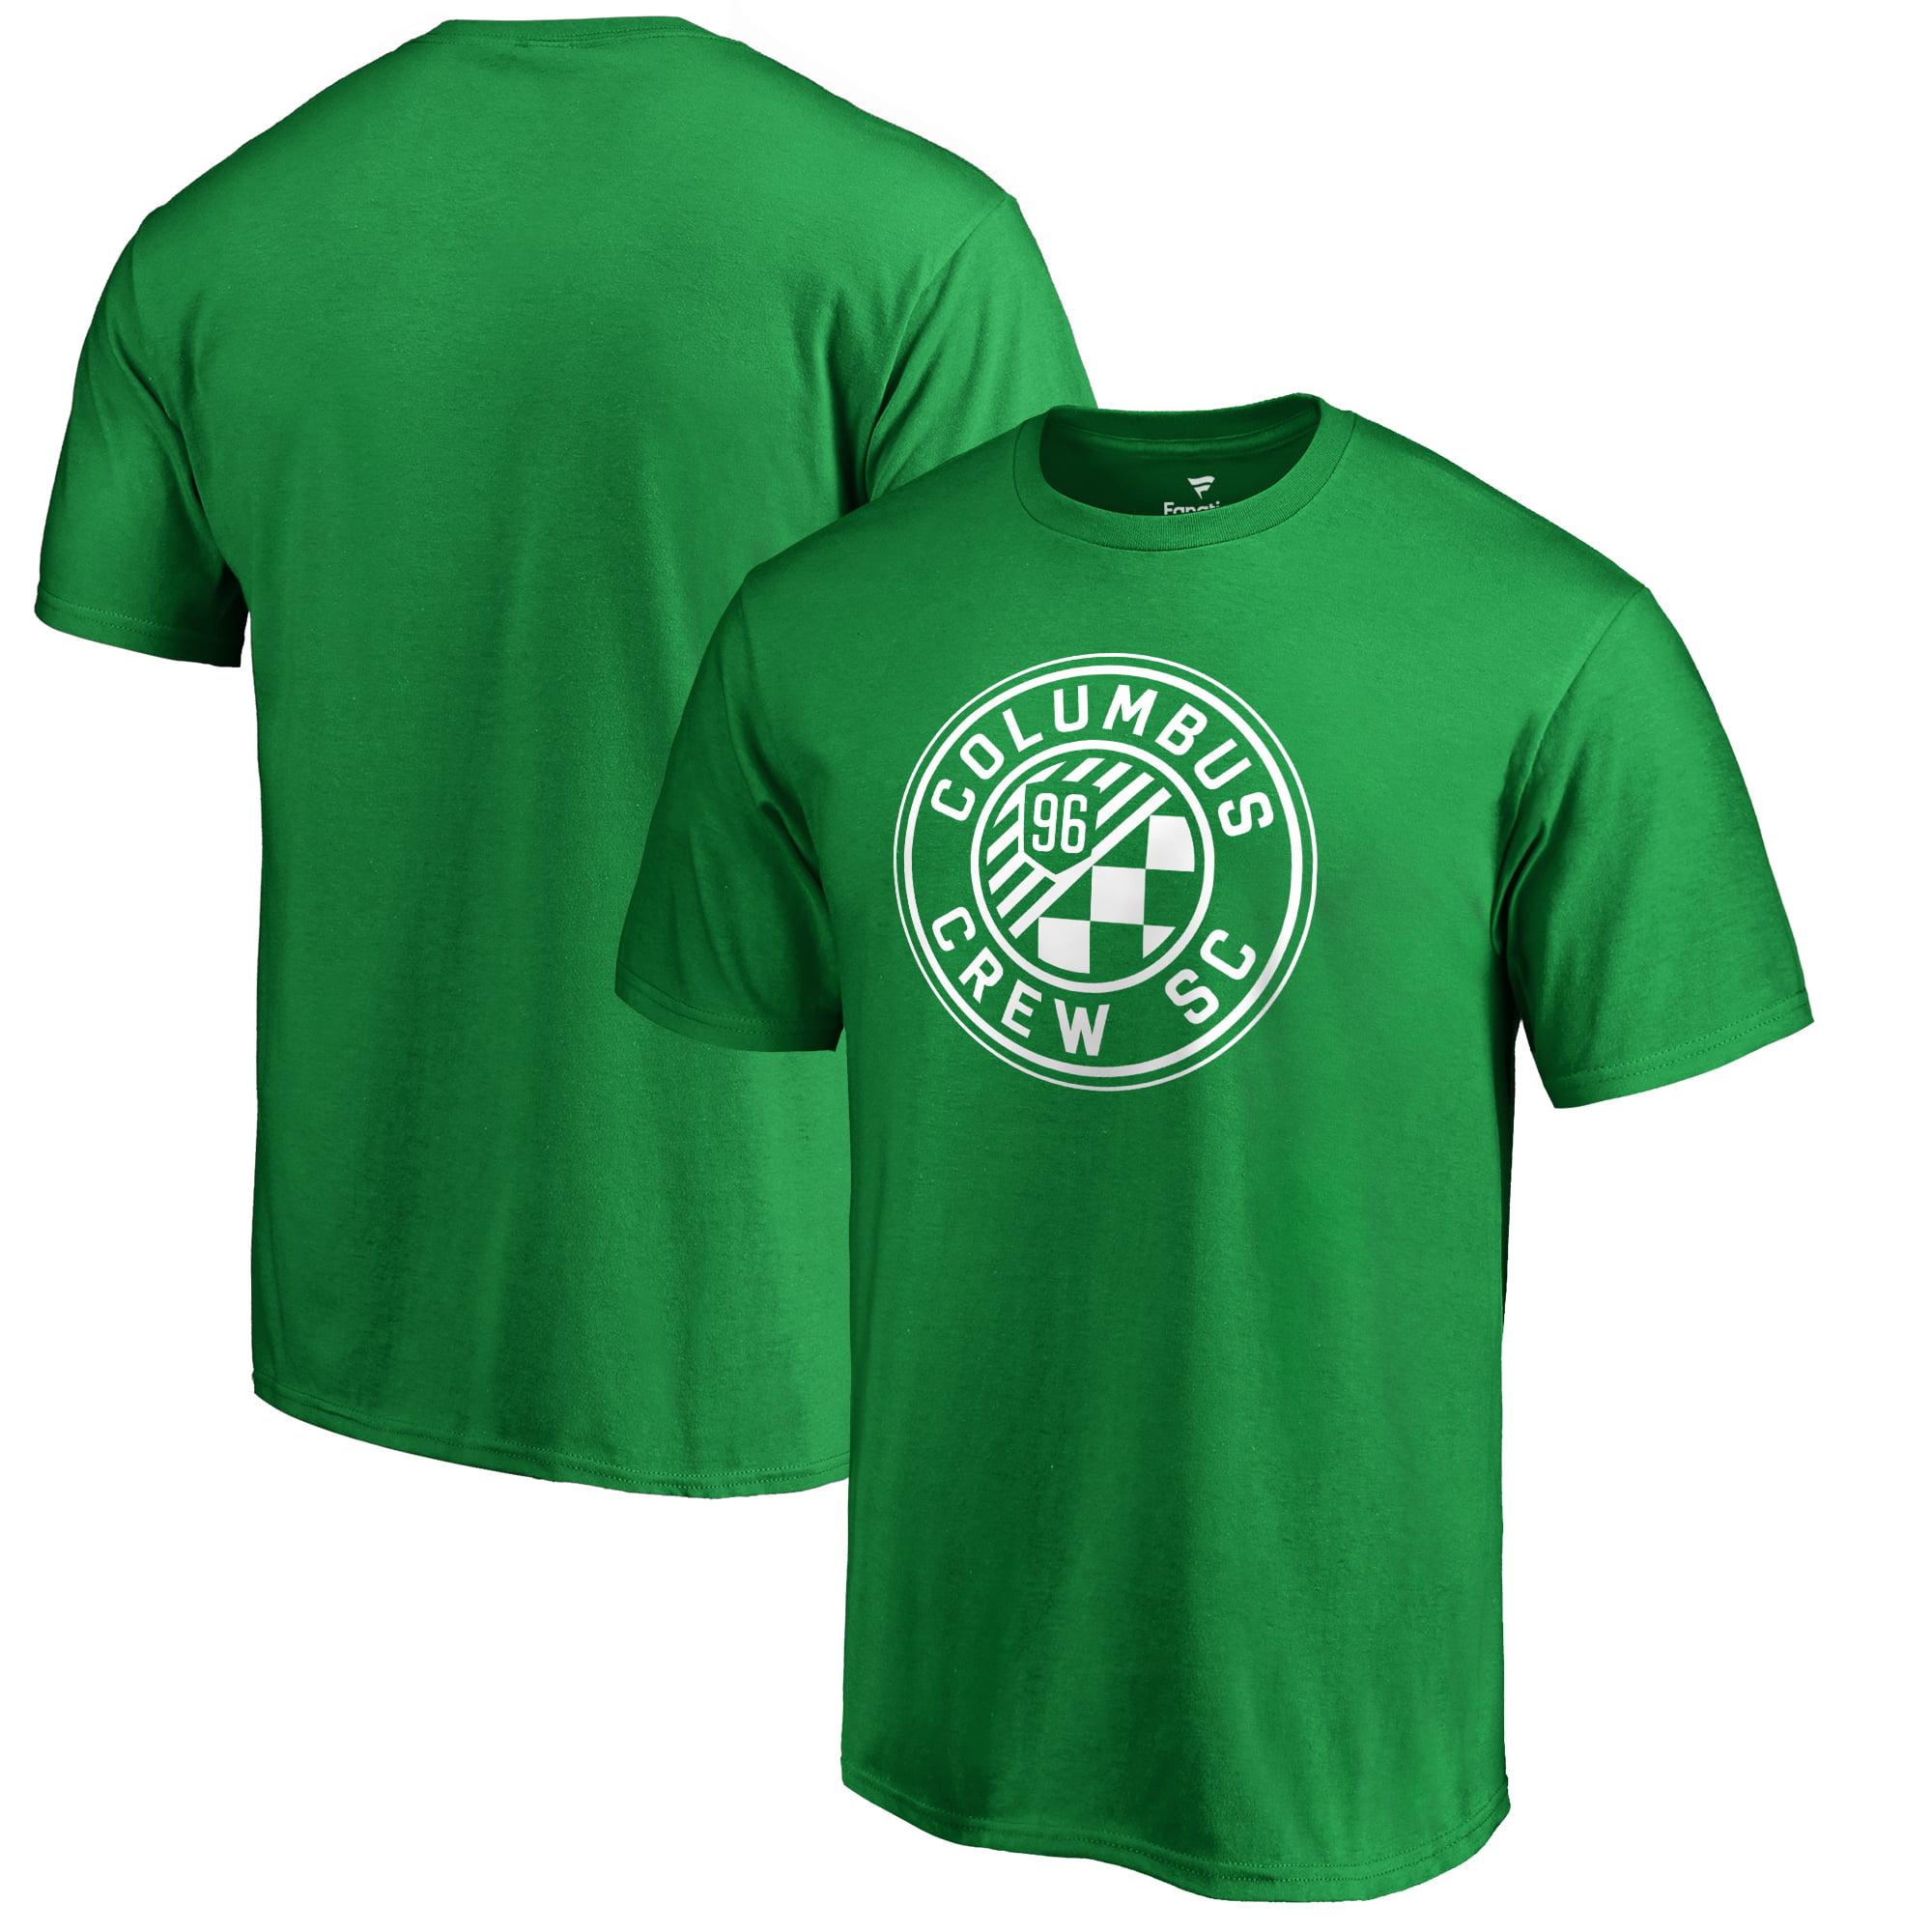 Columbus Crew SC Fanatics Branded St. Patrick's Day White Logo T-Shirt - Kelly Green